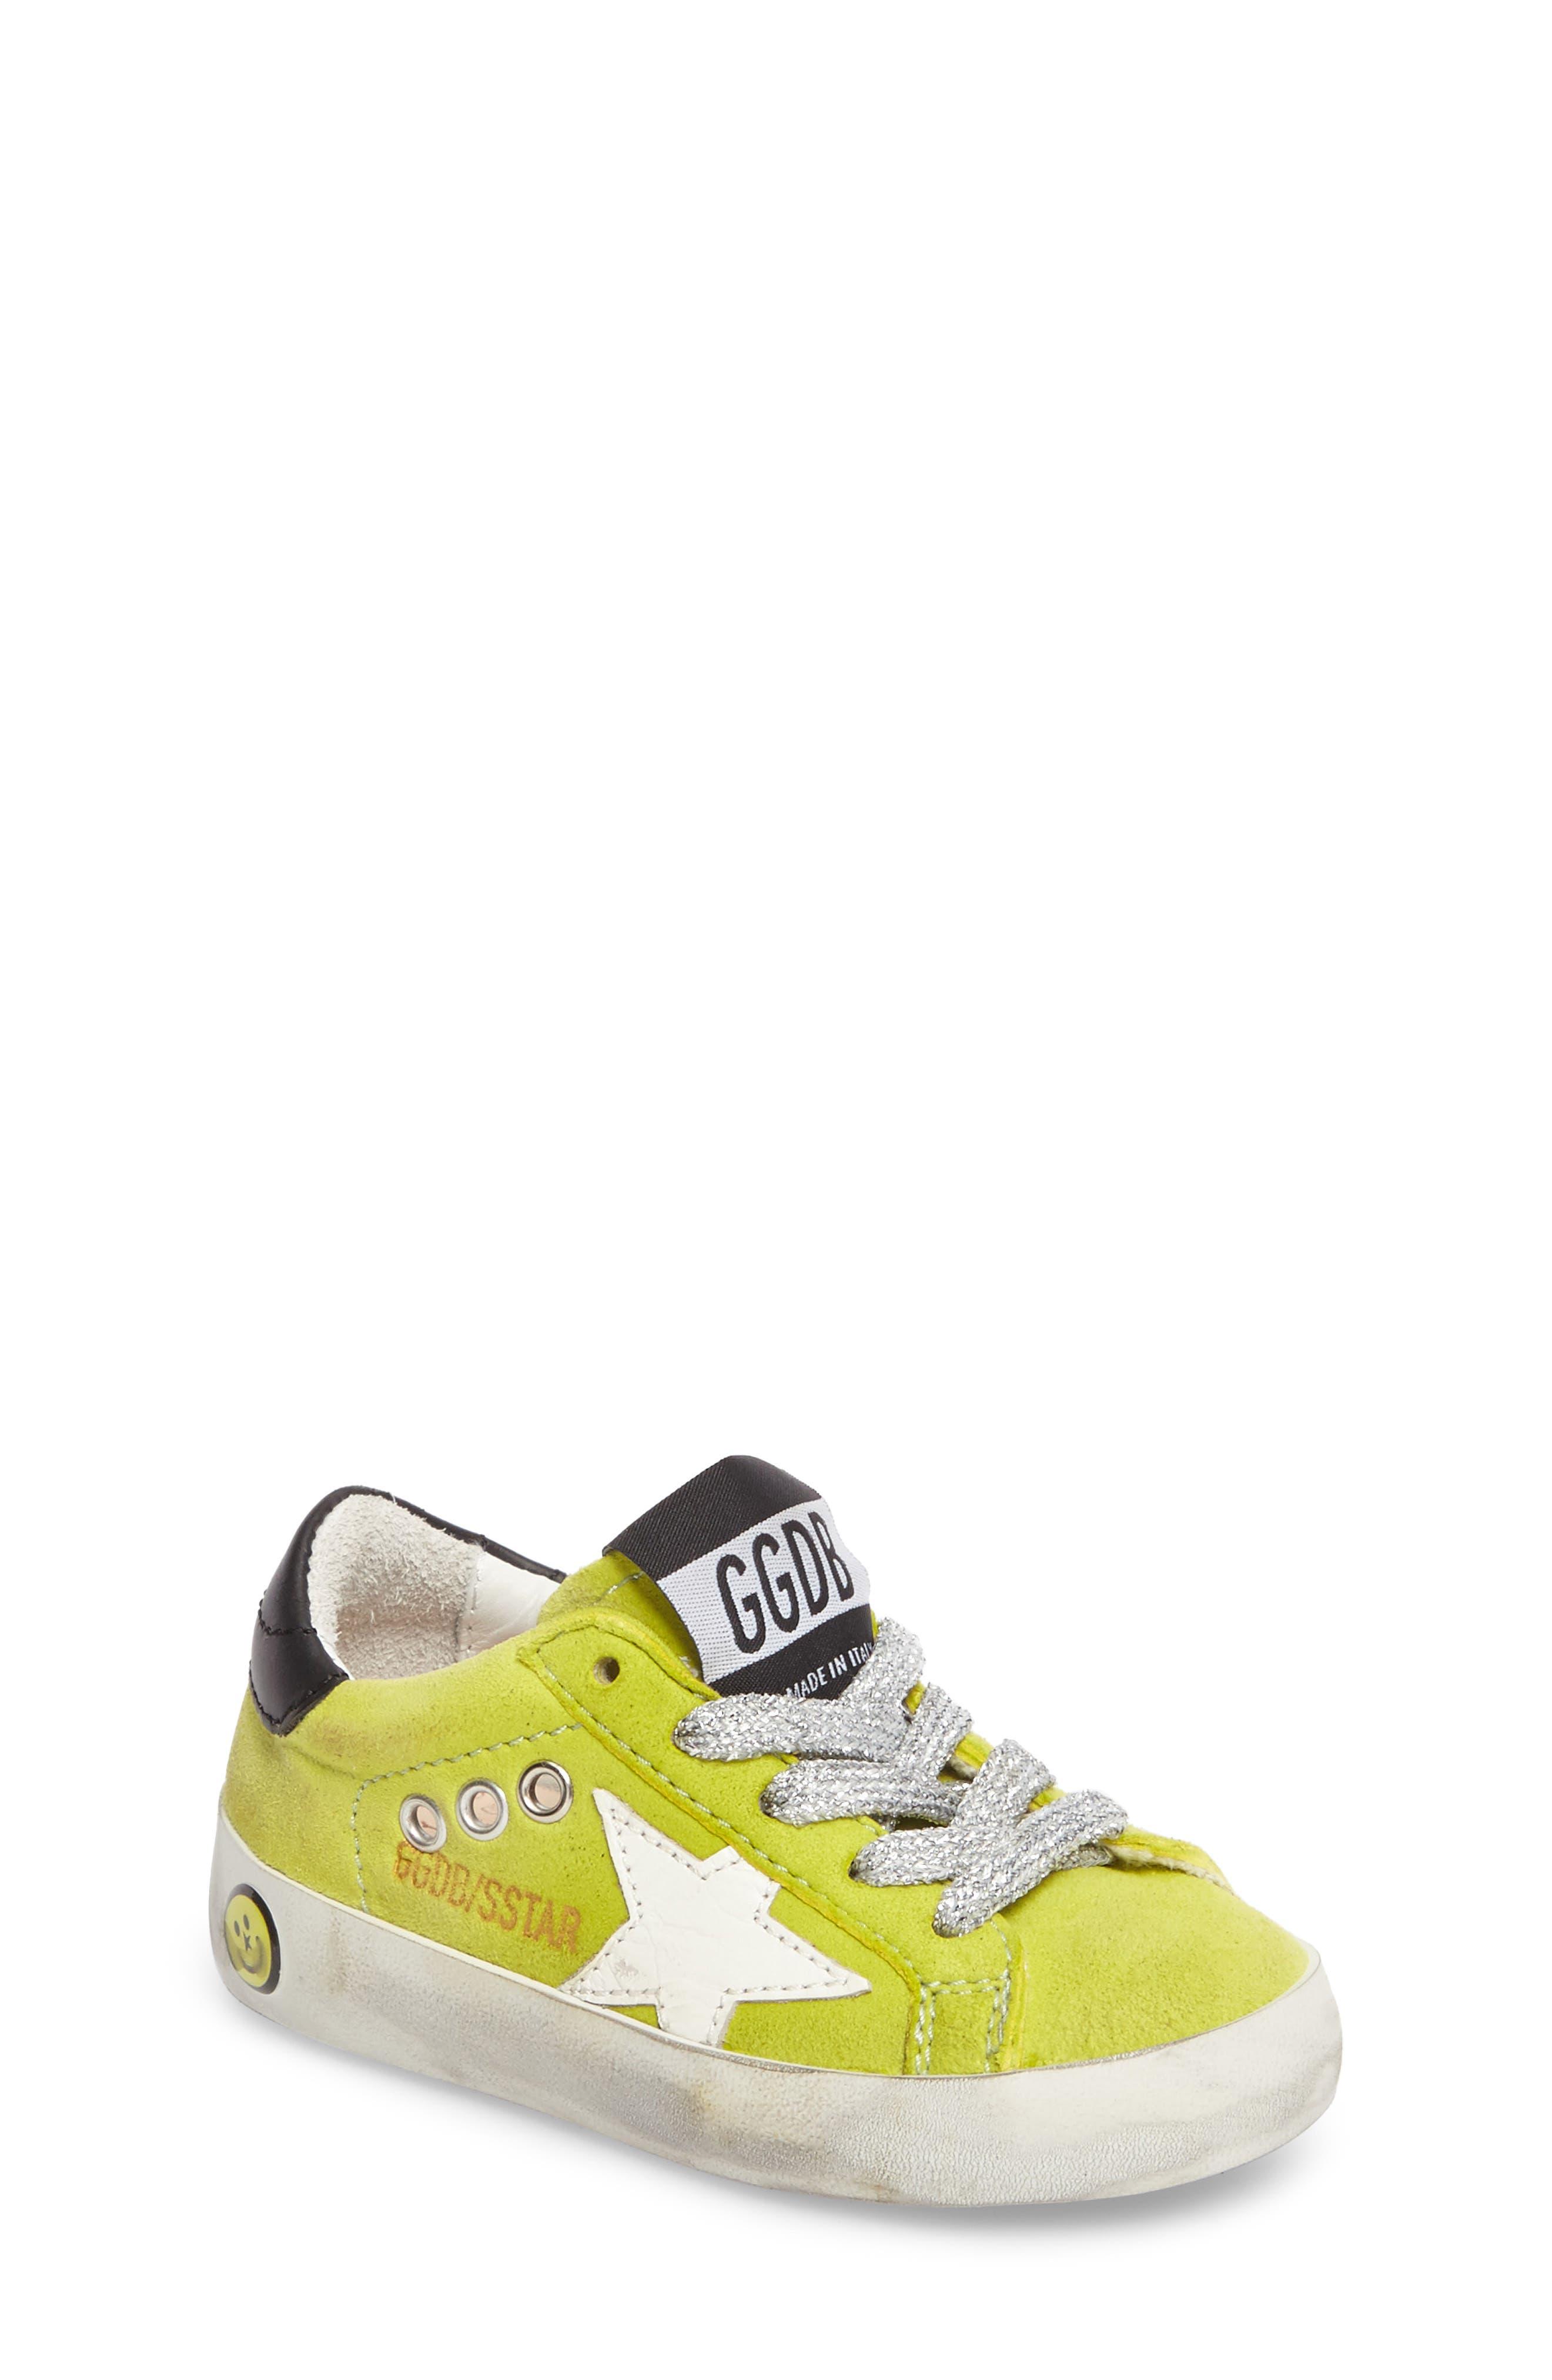 Superstar Low Top Sneaker,                             Main thumbnail 1, color,                             300